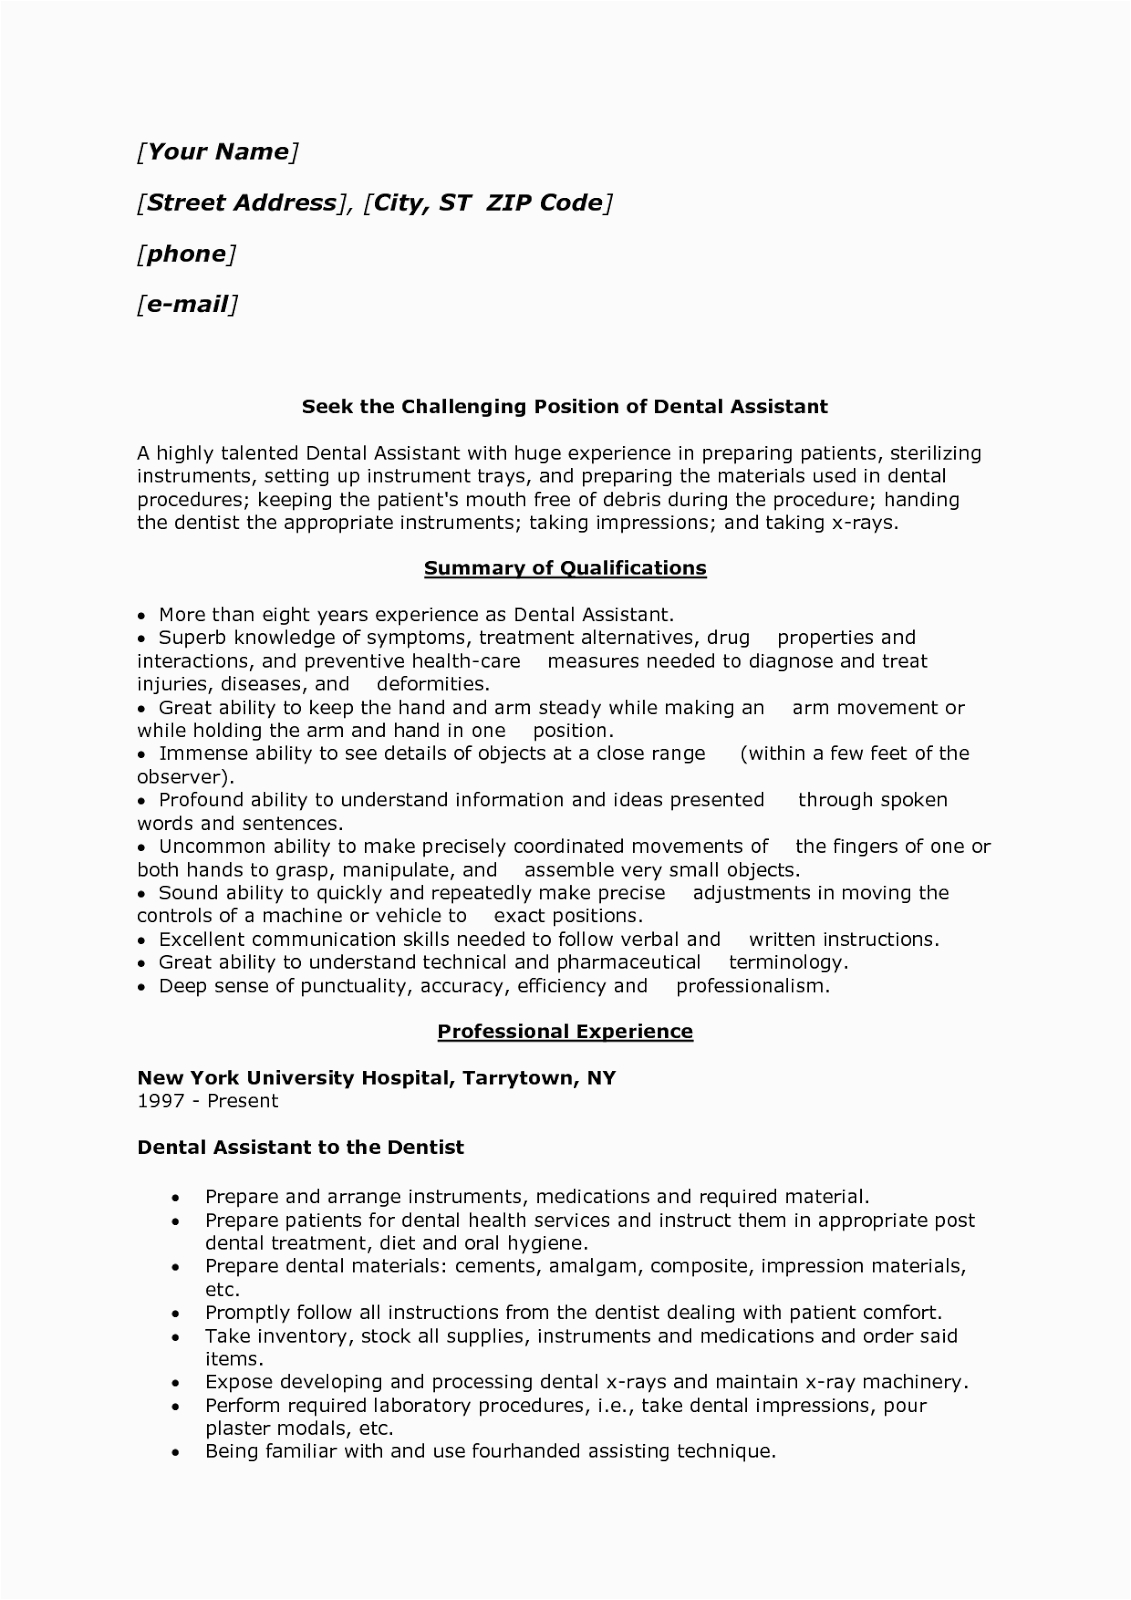 sample of dental assistant resume entry